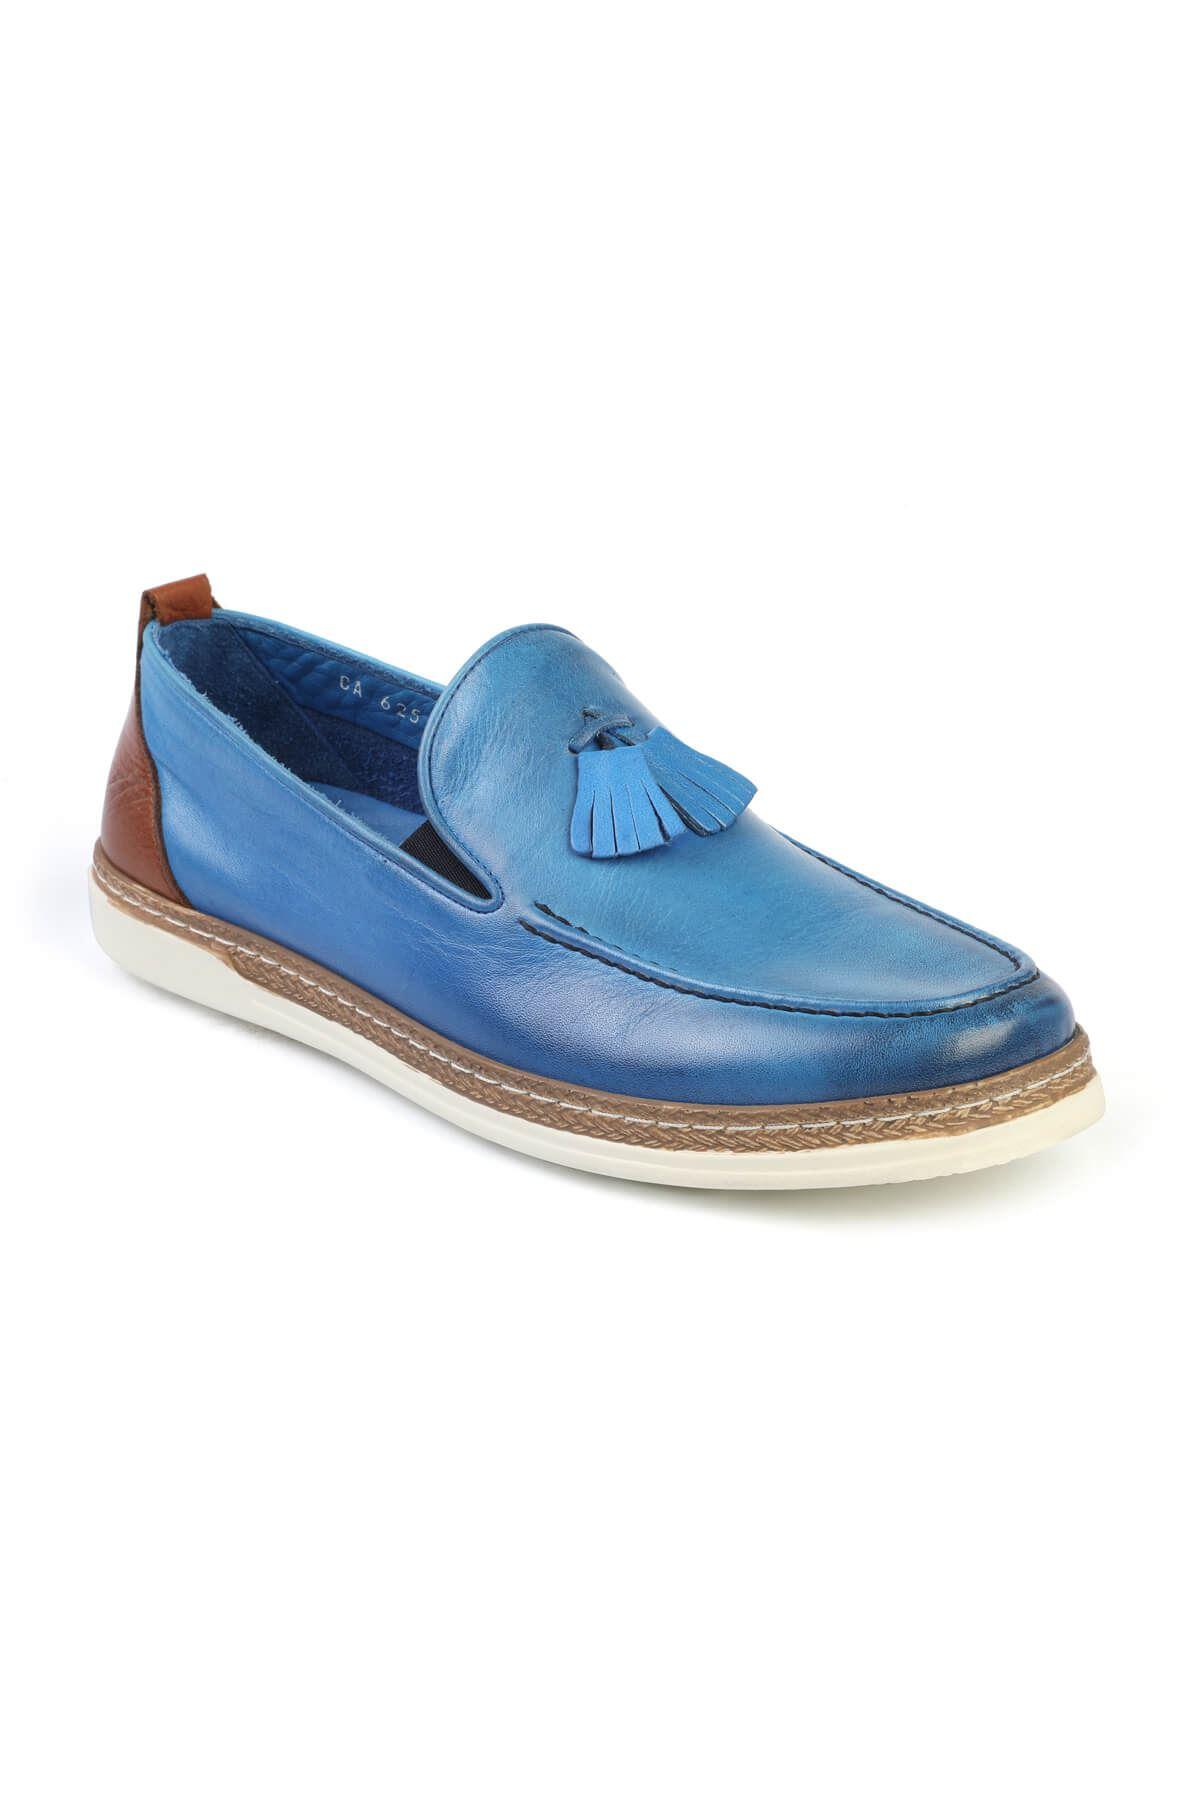 Libero C625 Saxe Blue Loafer Shoes